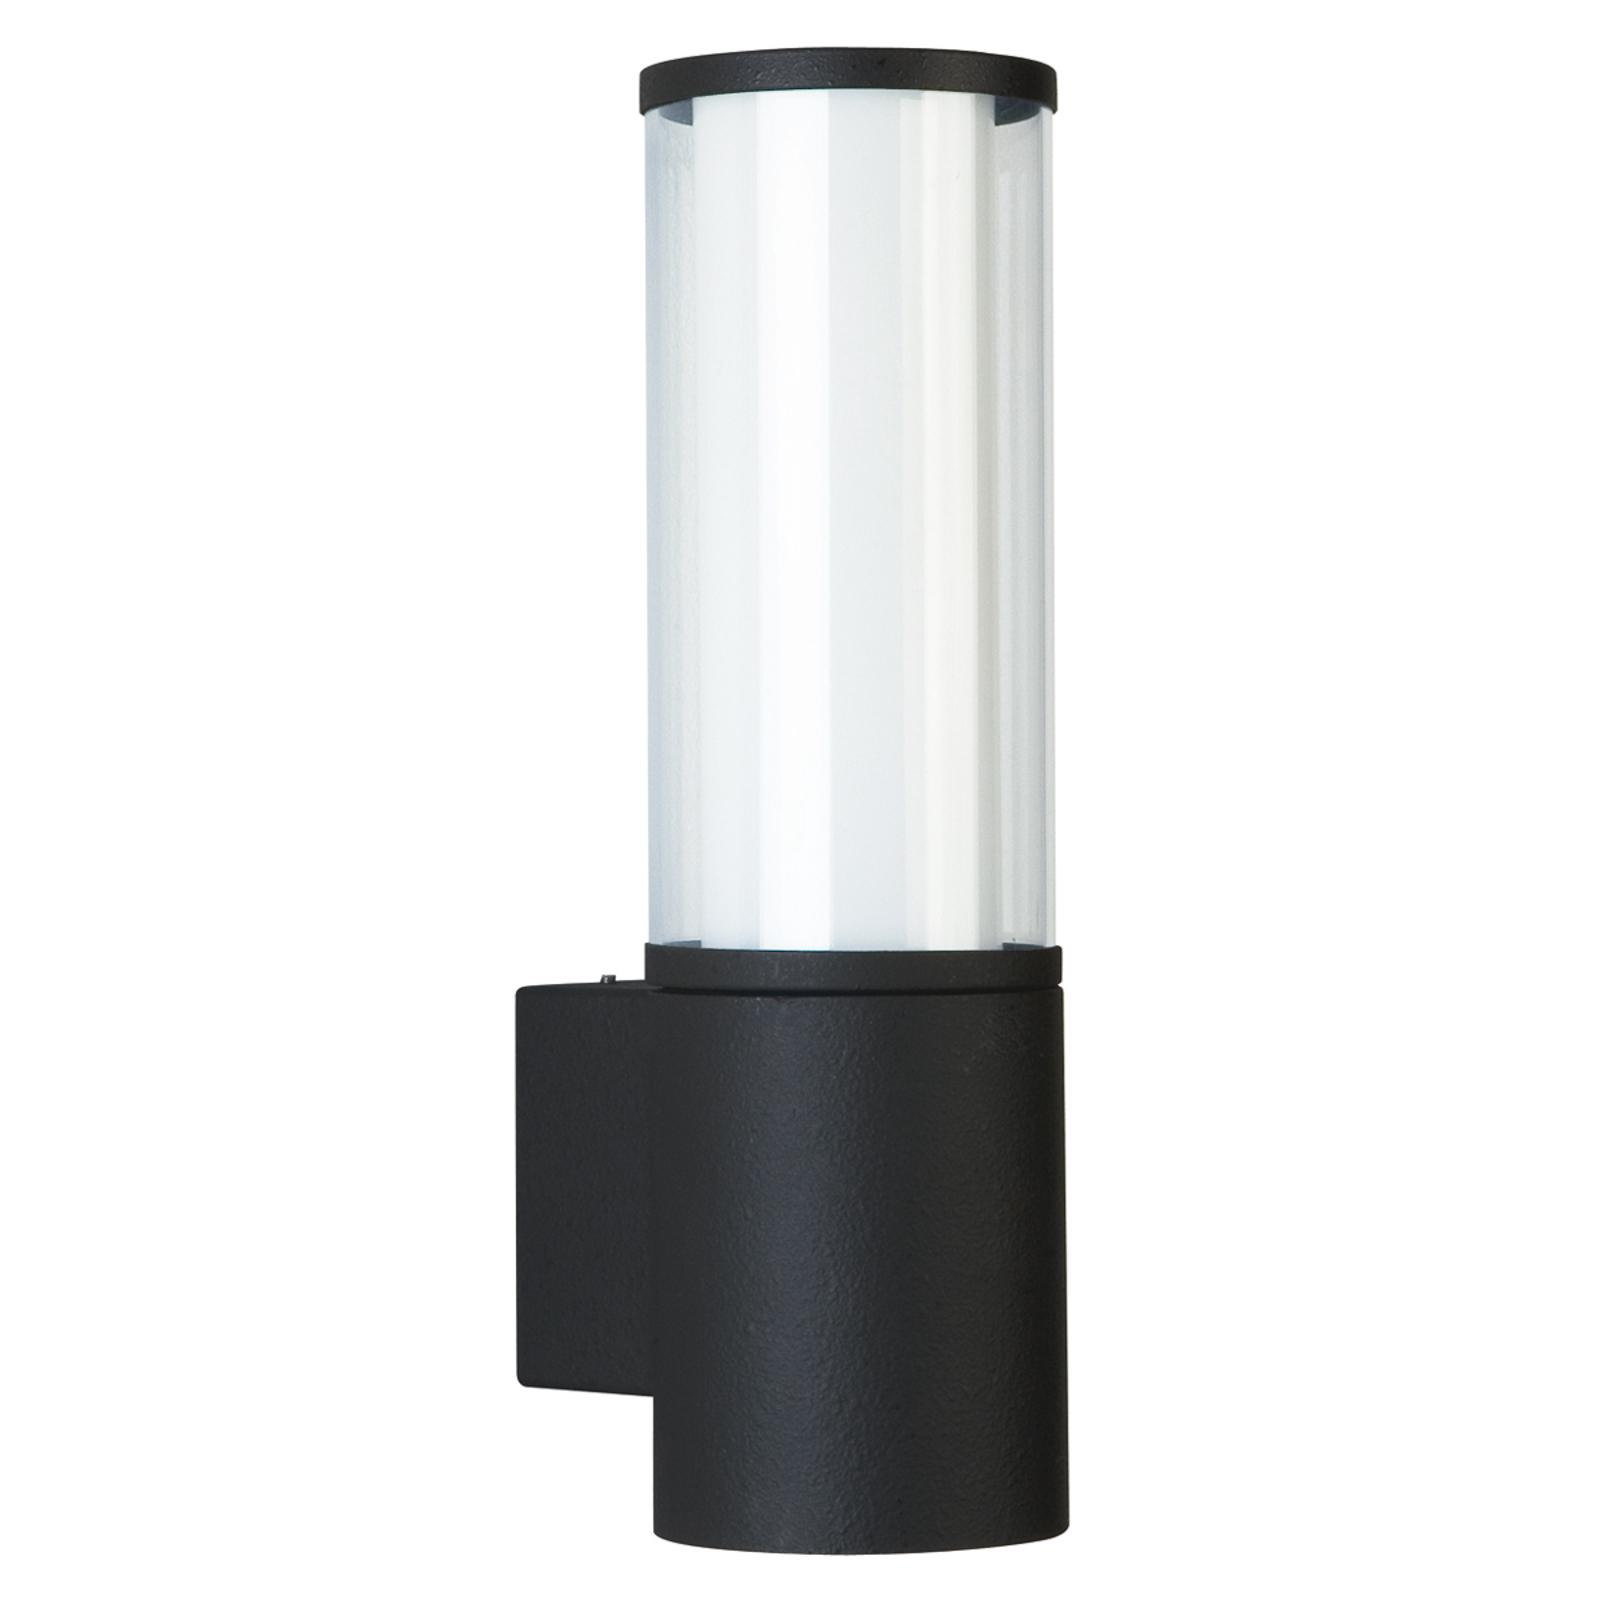 Moderne buitenwandlamp Giulia zwart